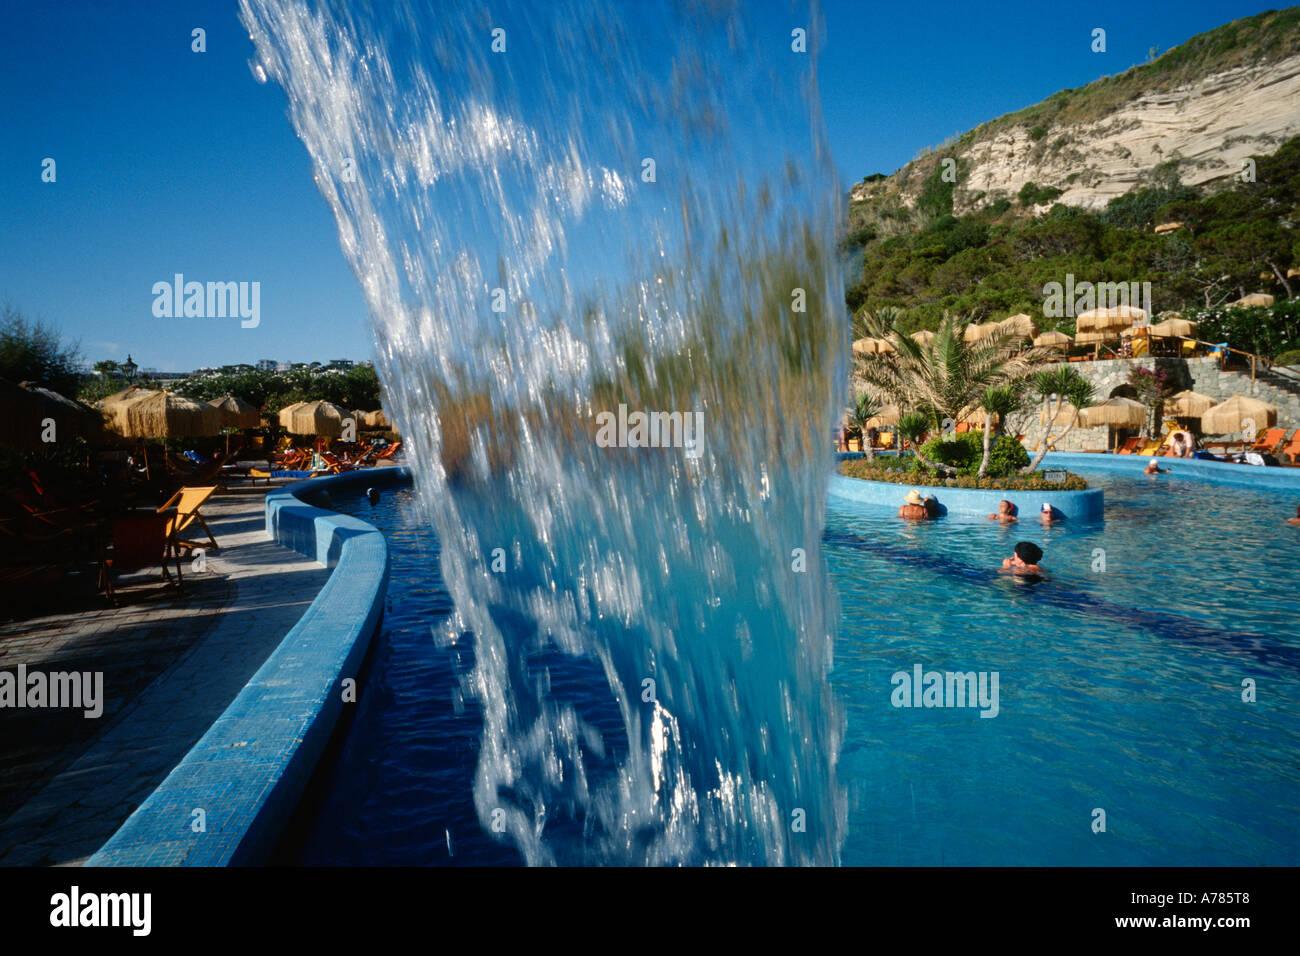 Ischia italy the thermal spa resort of giardini poseidon stock photo royalty free image - Giardini di poseidon ischia ...